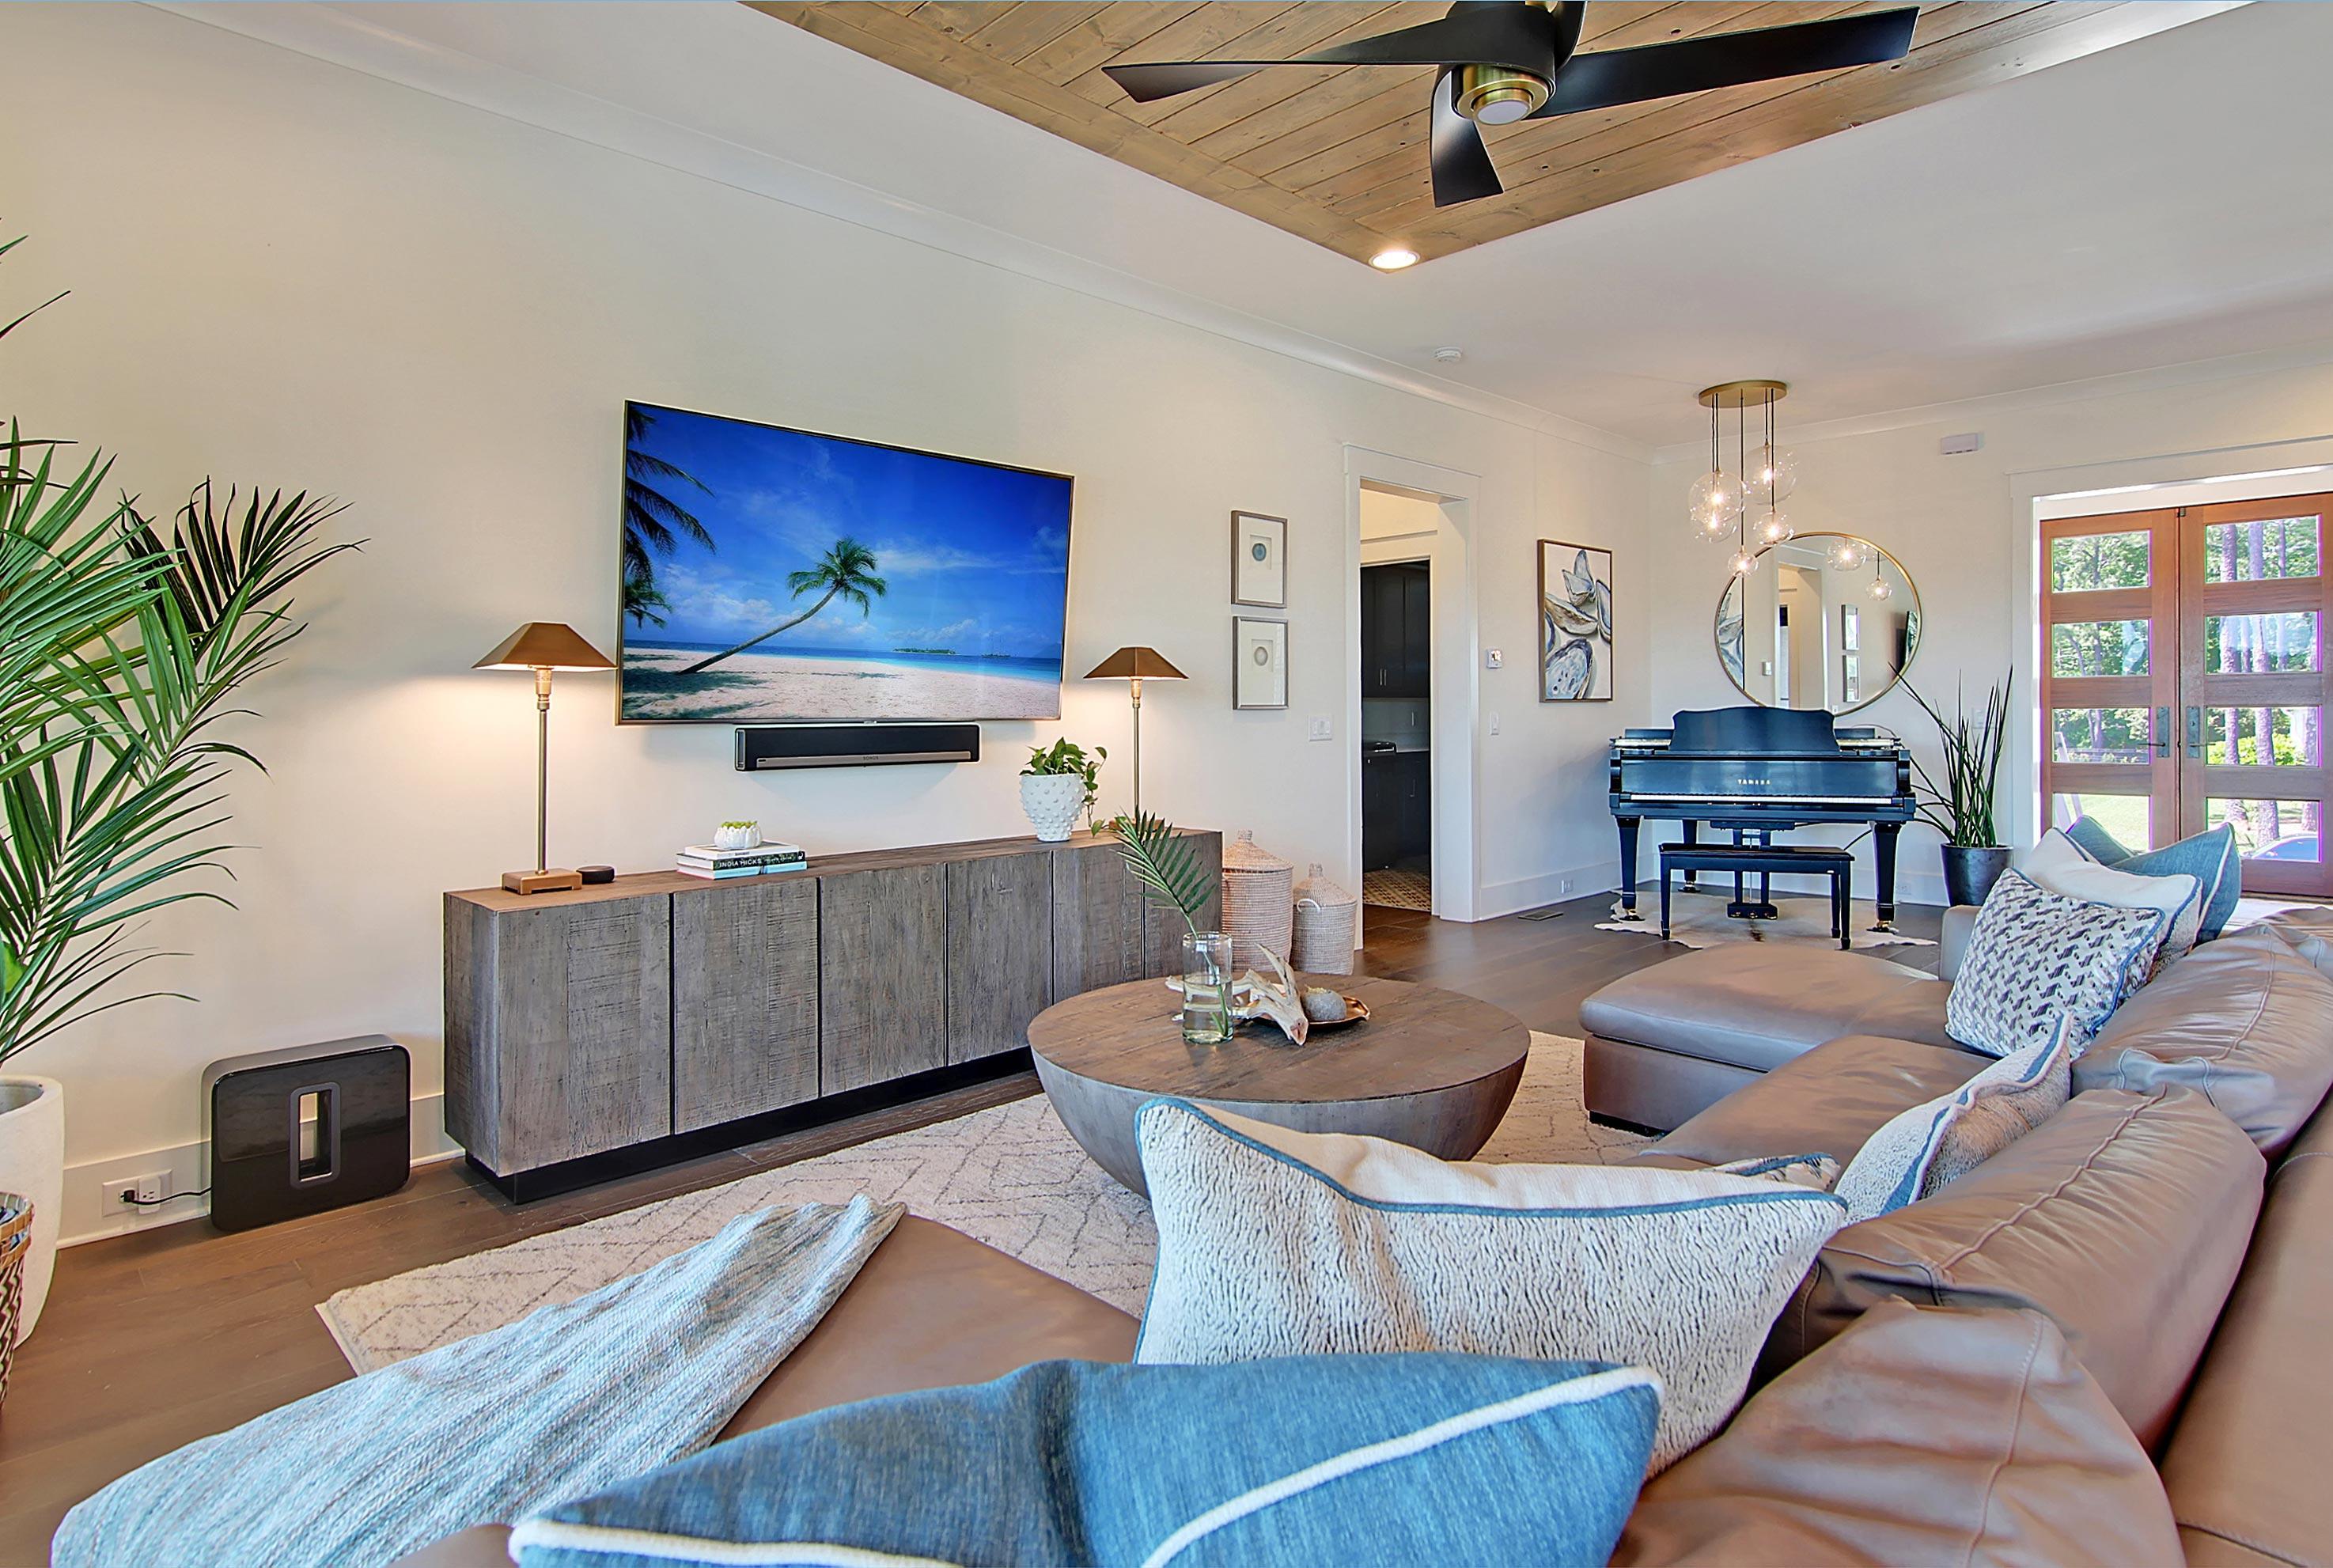 Dunes West Homes For Sale - 2456 Darts Cove, Mount Pleasant, SC - 56